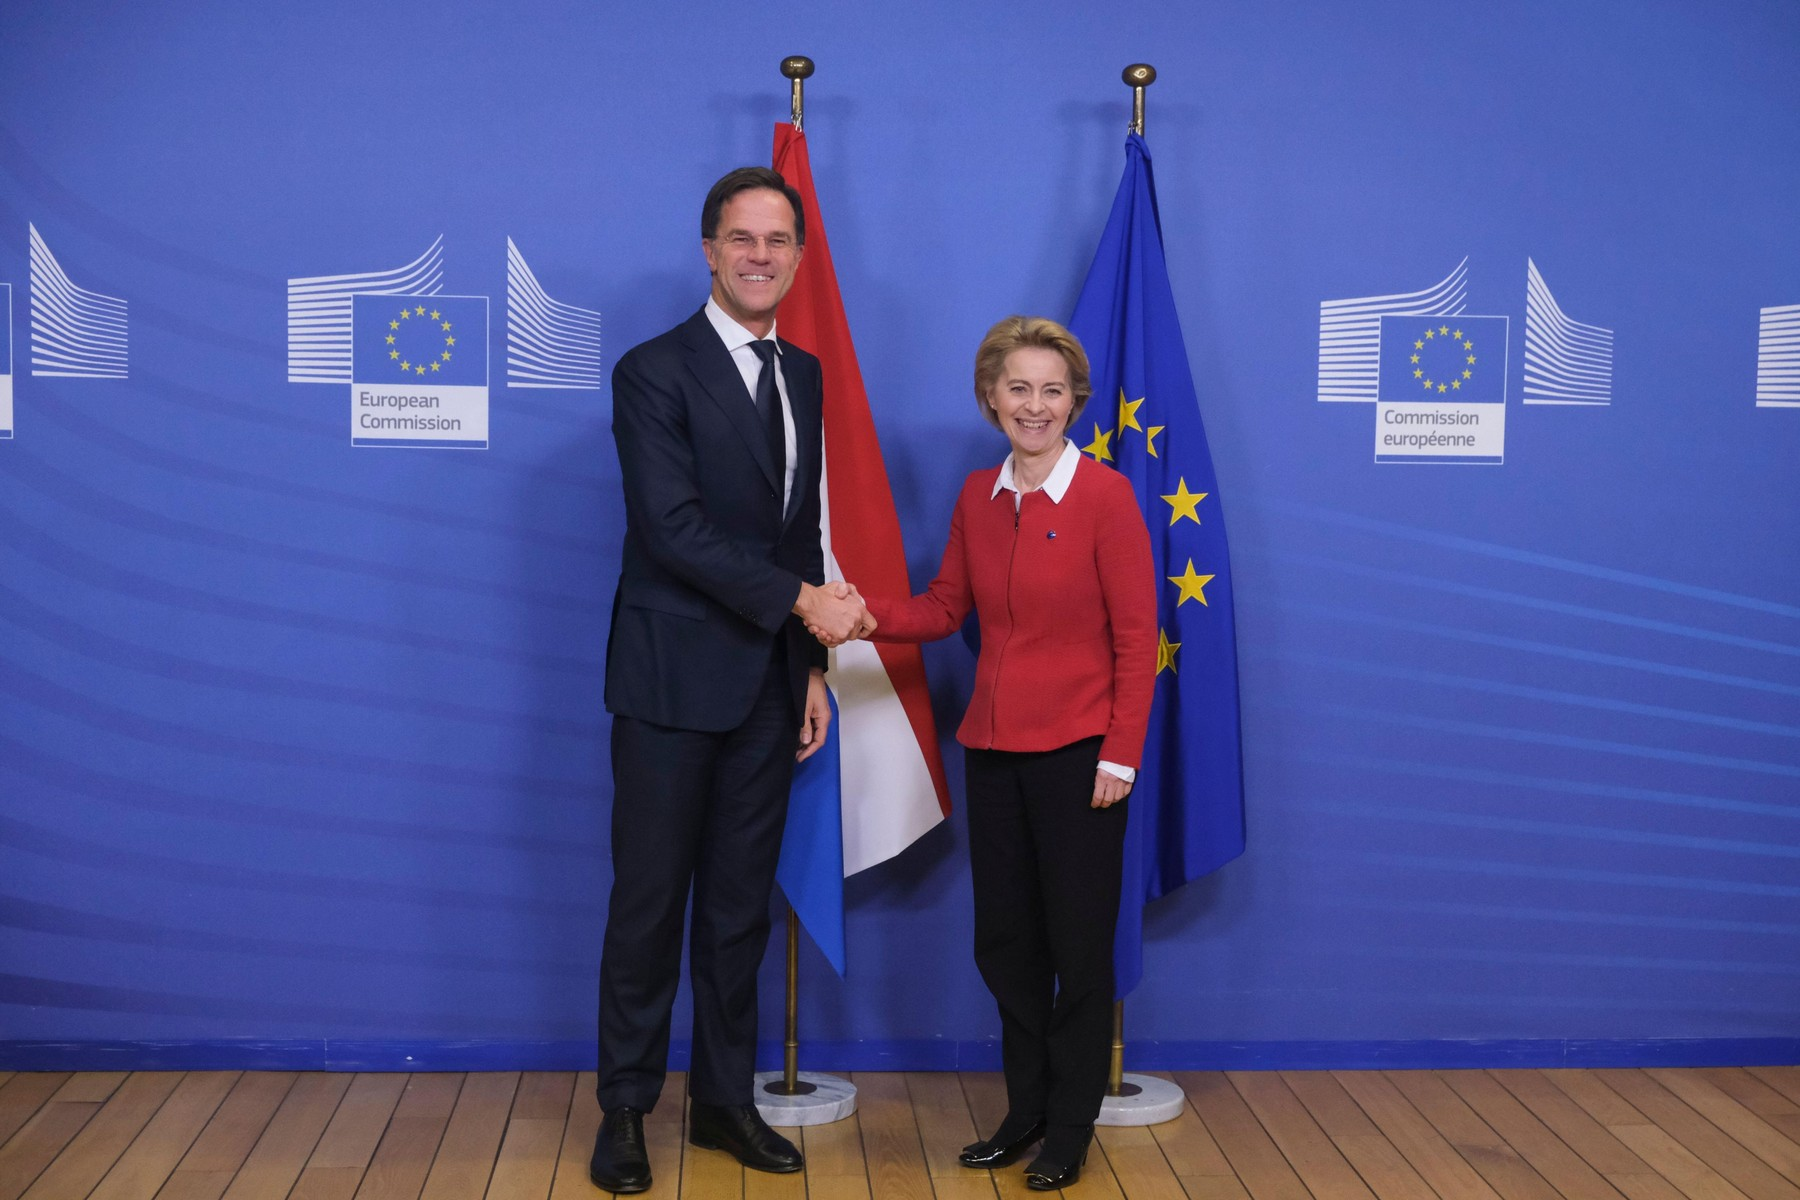 Nizozemski premijer Mark Rutte i predsjednica Europske komisije Ursula von der Leyen